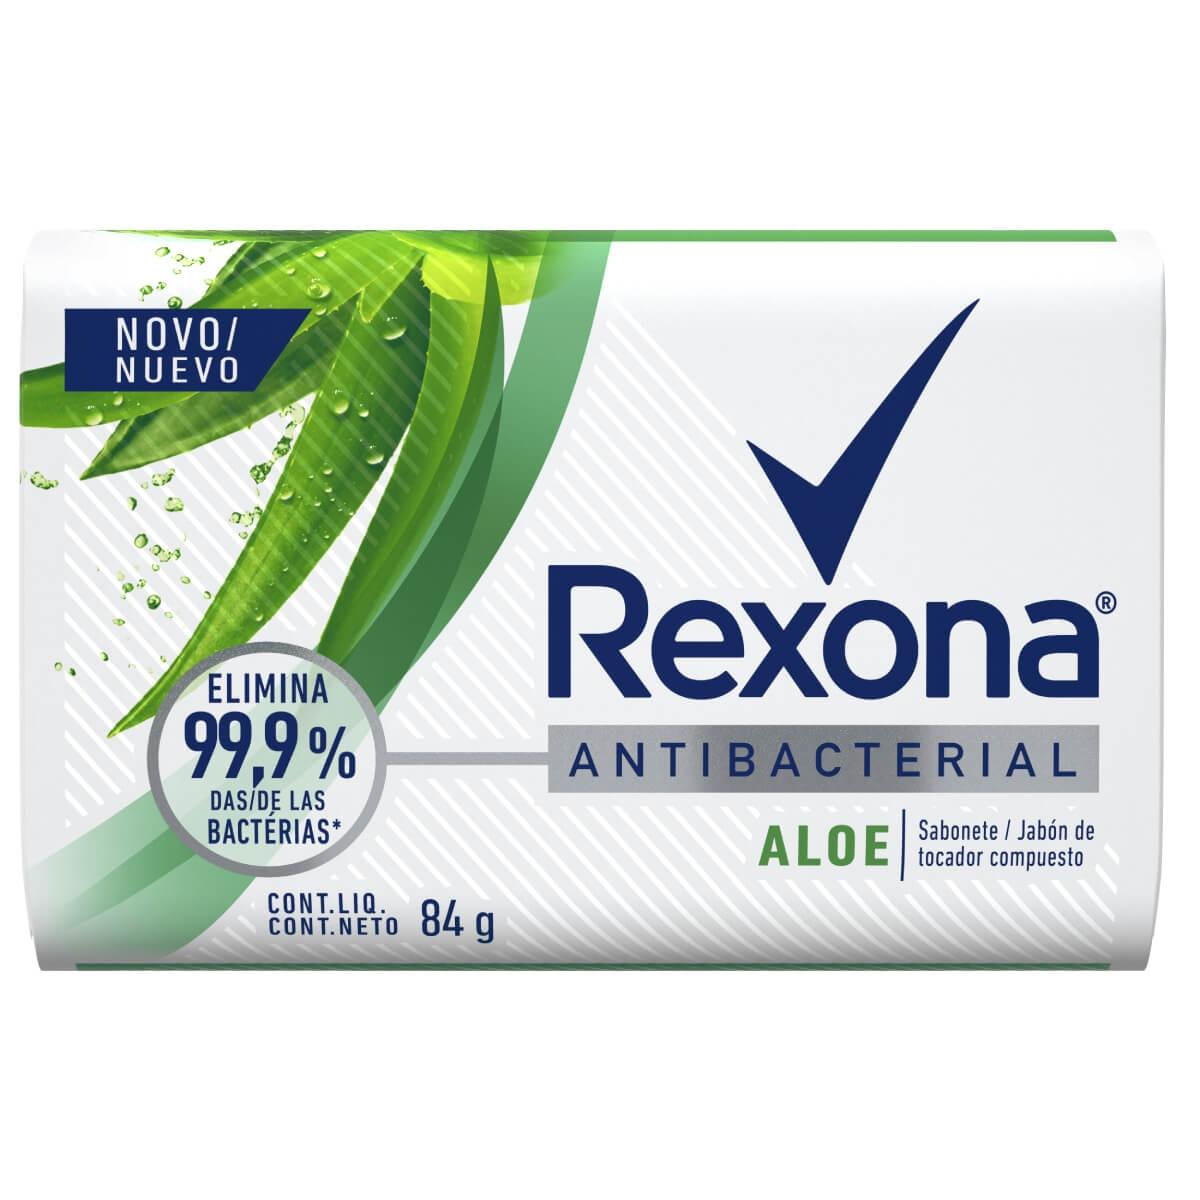 Sabonete Barra Rexona Antibacterial Aloe 84g 84g